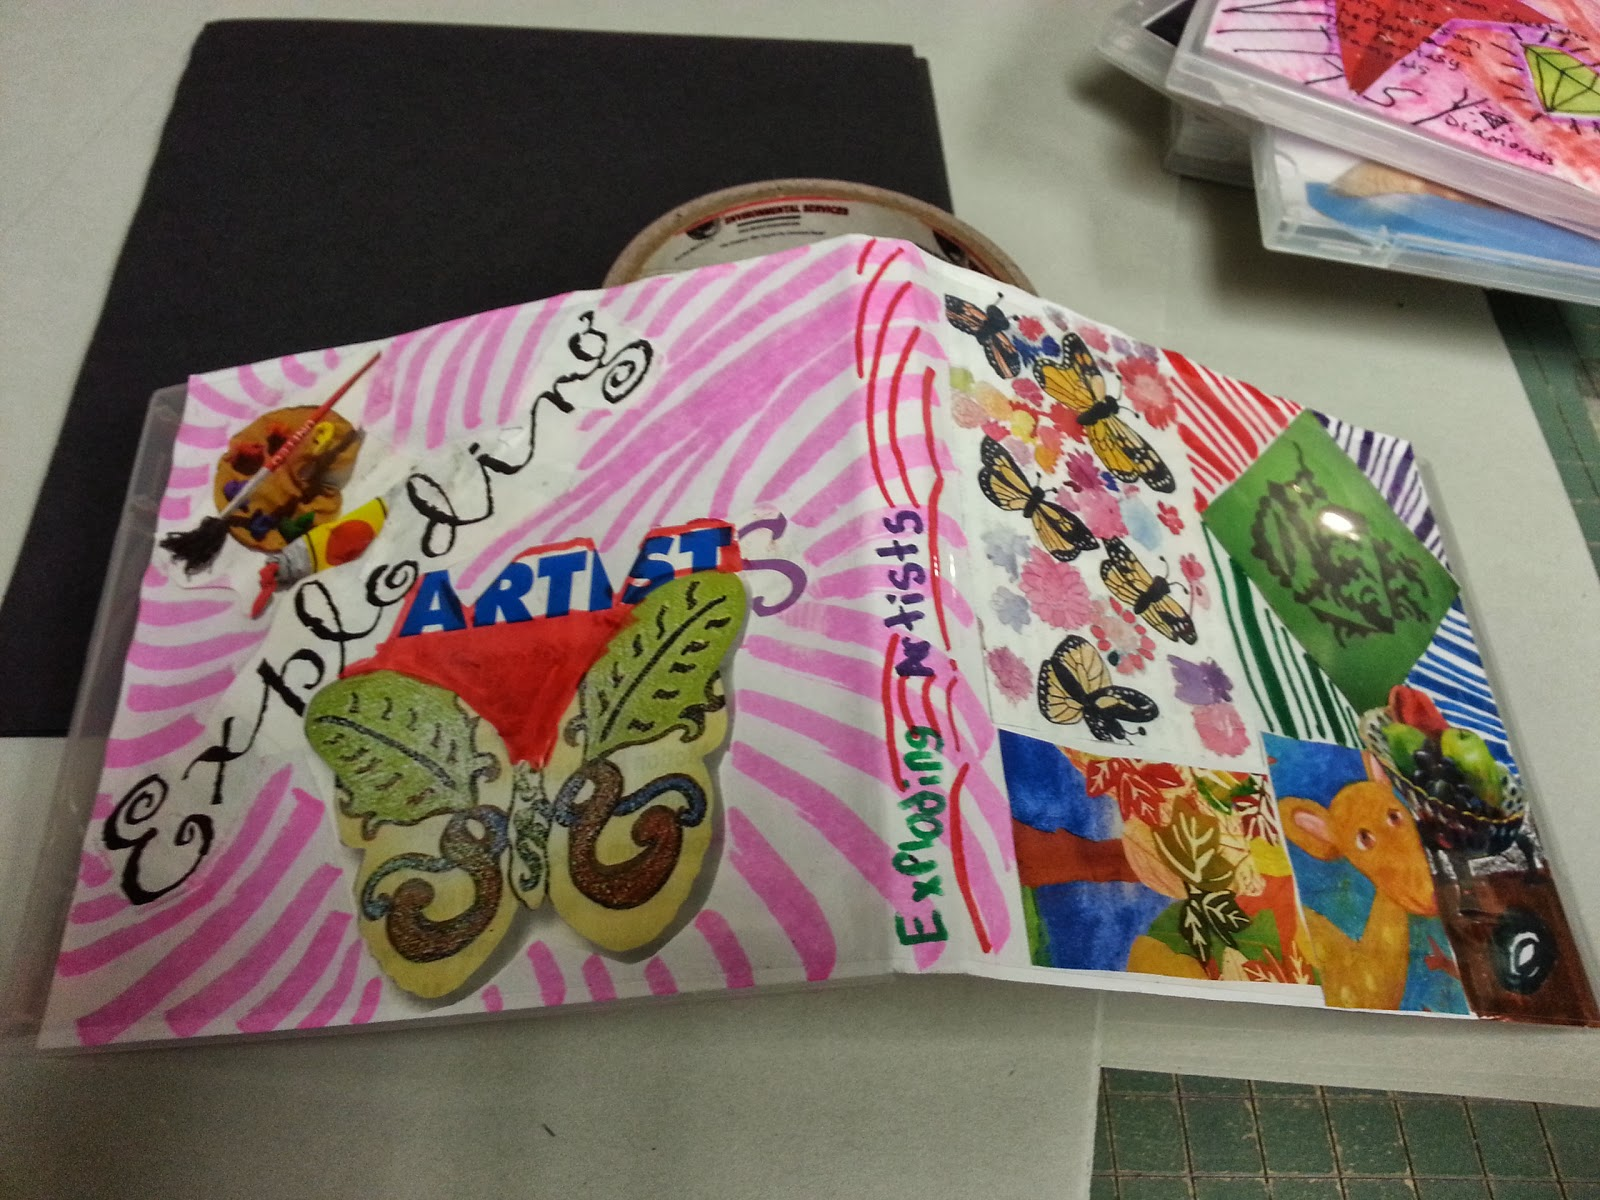 Artsy Girl Crafty World: Album covers